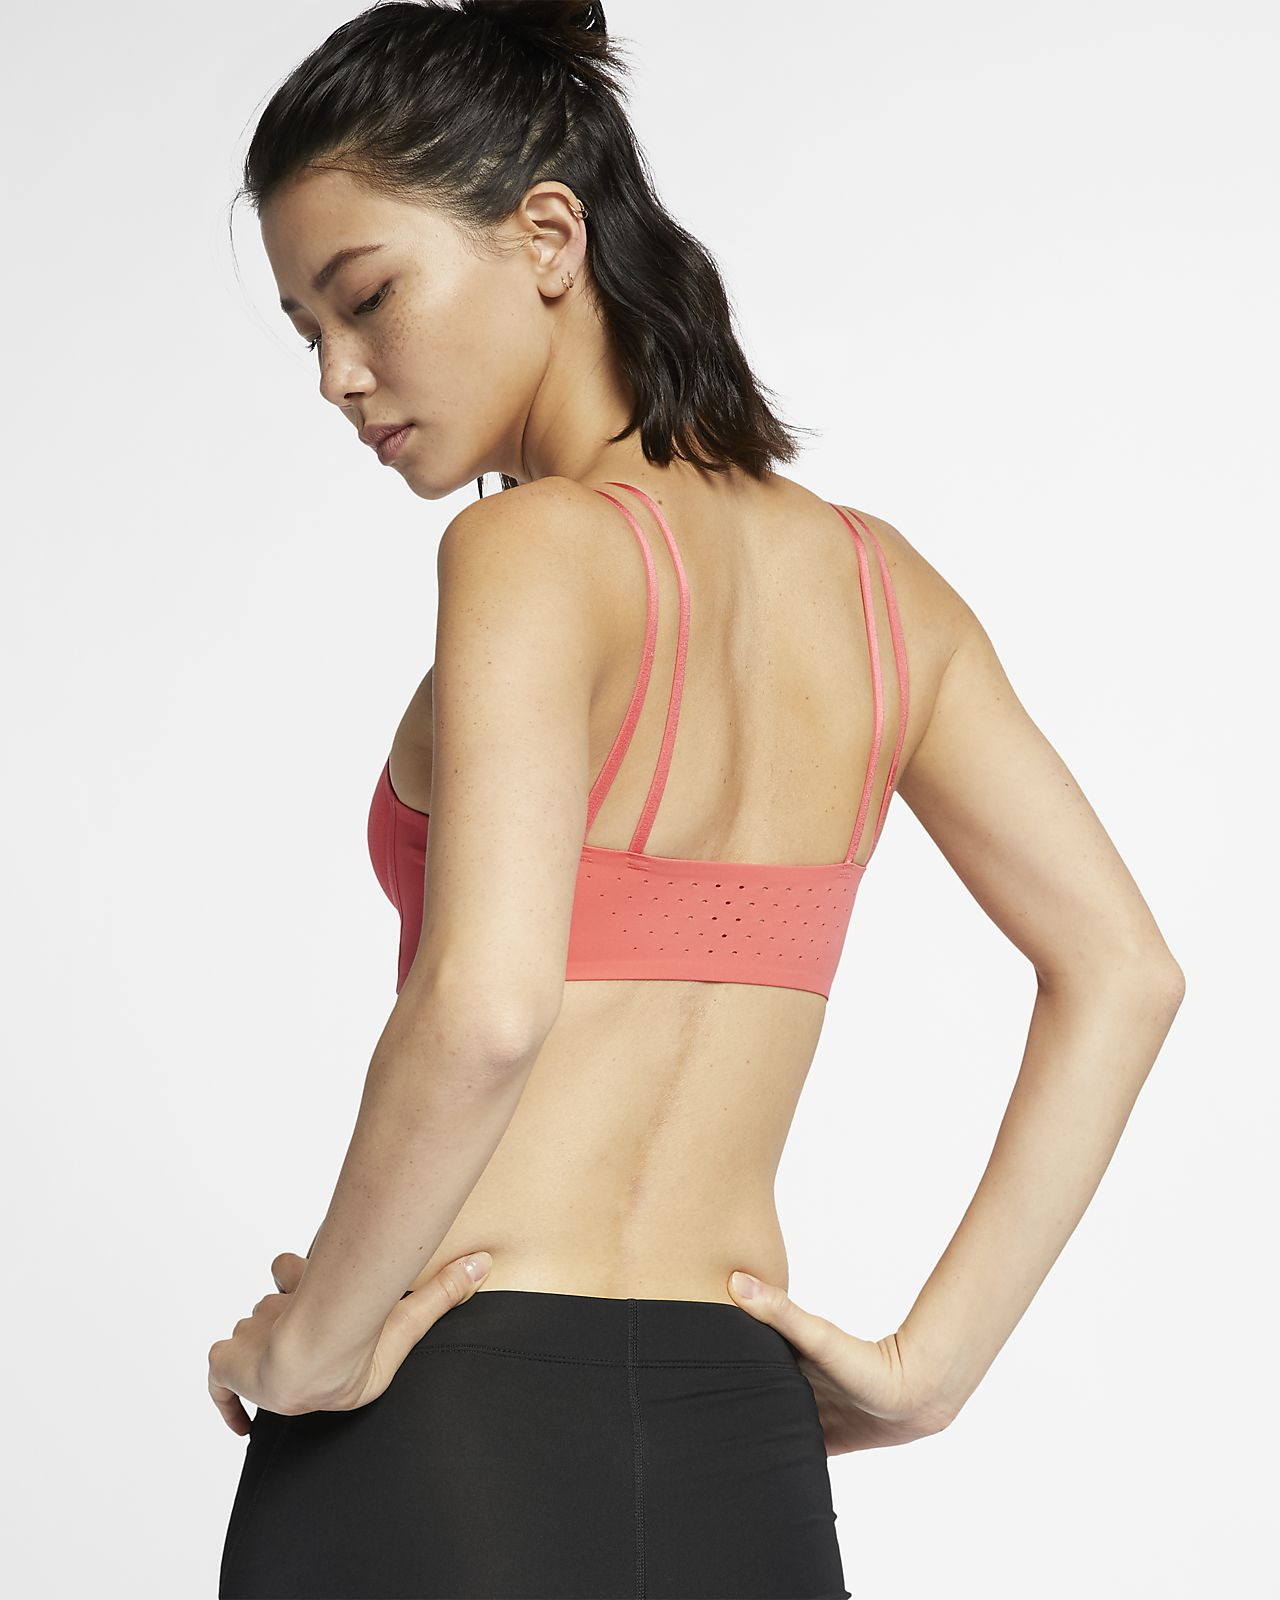 c4d533b686 Nike Indy Breathe Women s Light Support Sports Bra. Nike.com IE